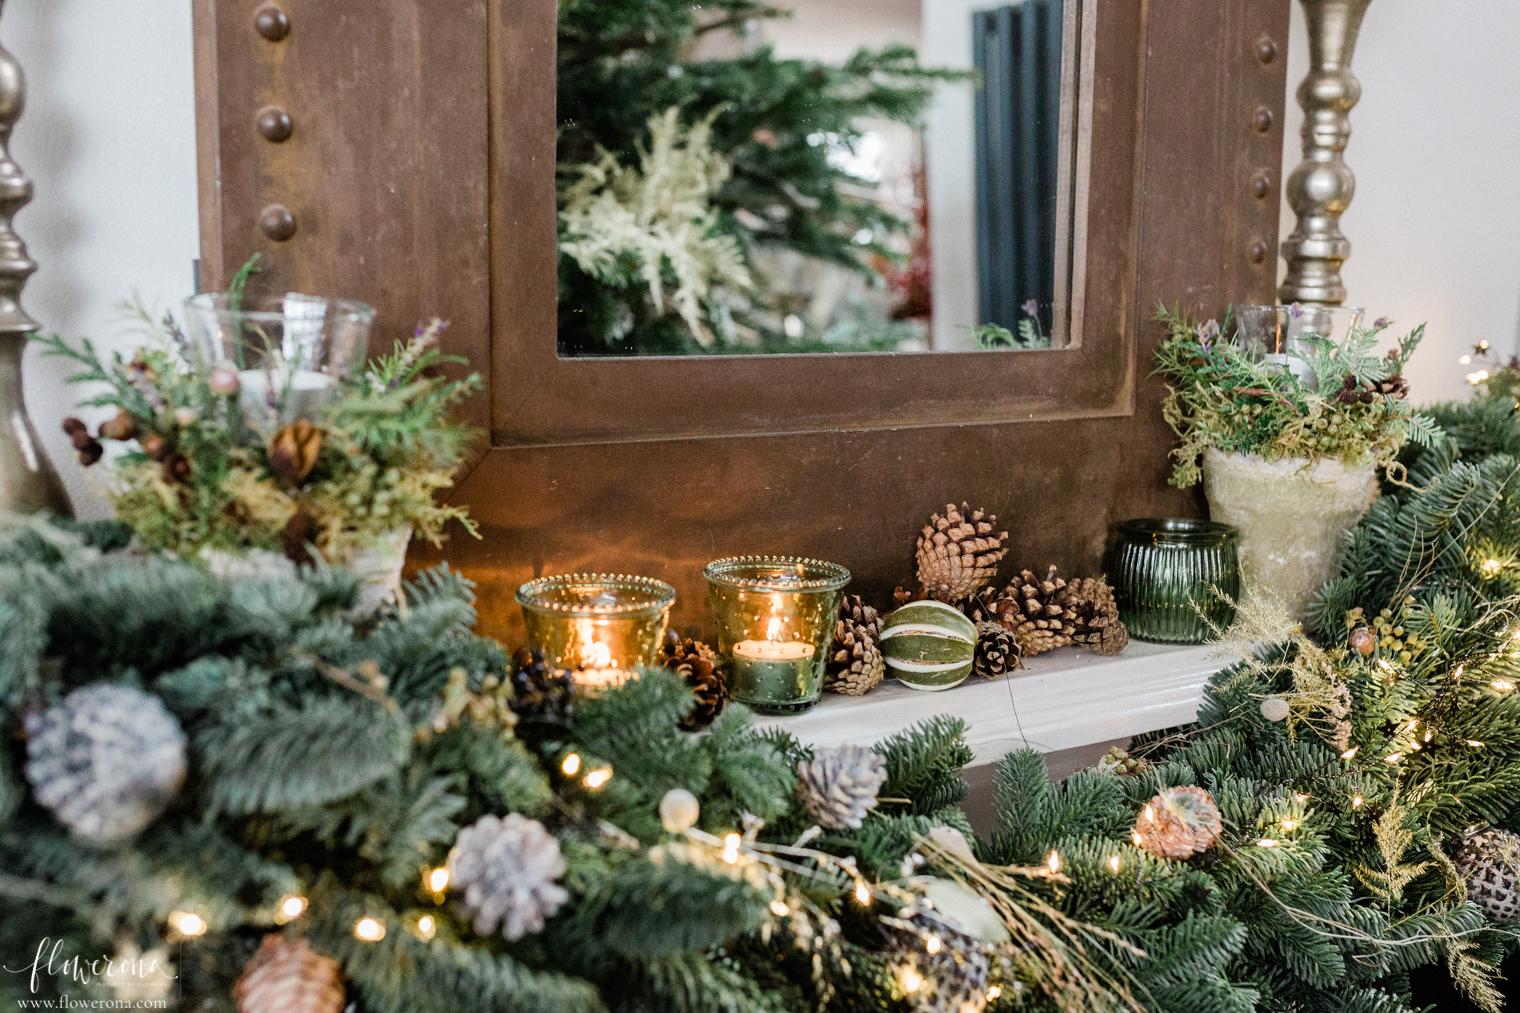 Festive mantelpiece